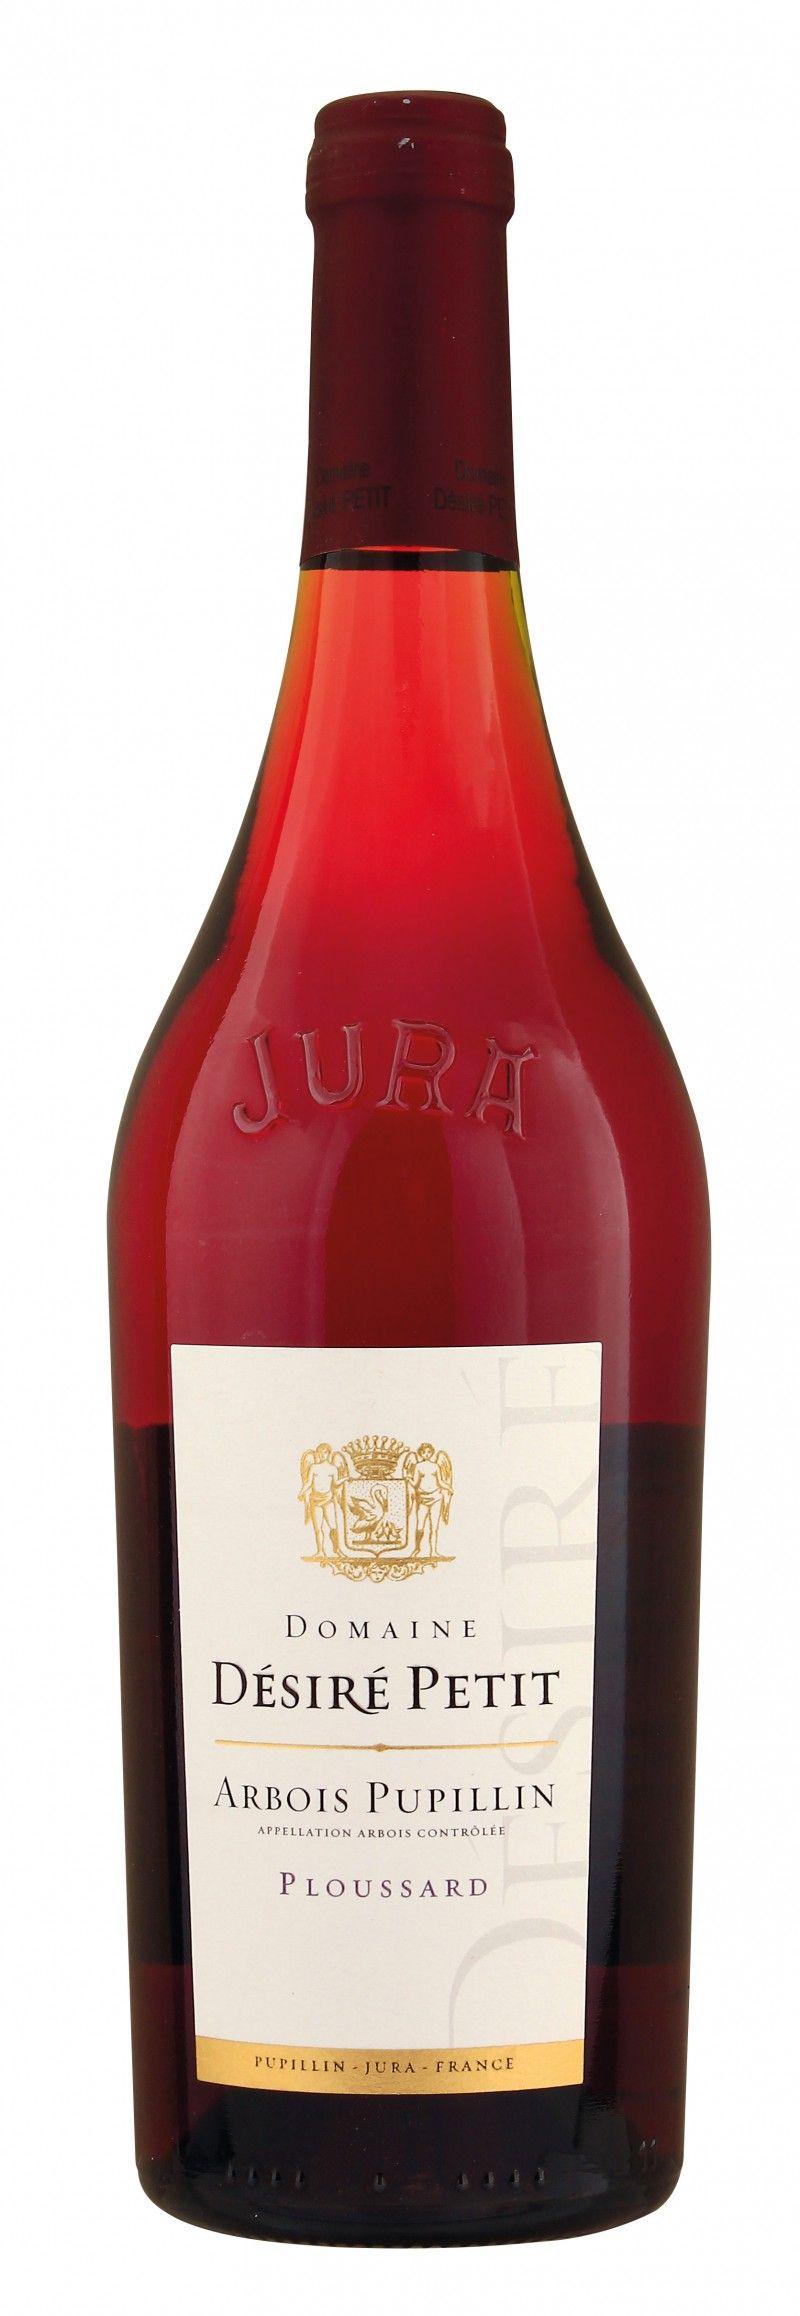 Ploussard 2014 Domaine Desire Petit Region Viticole Vin Jura